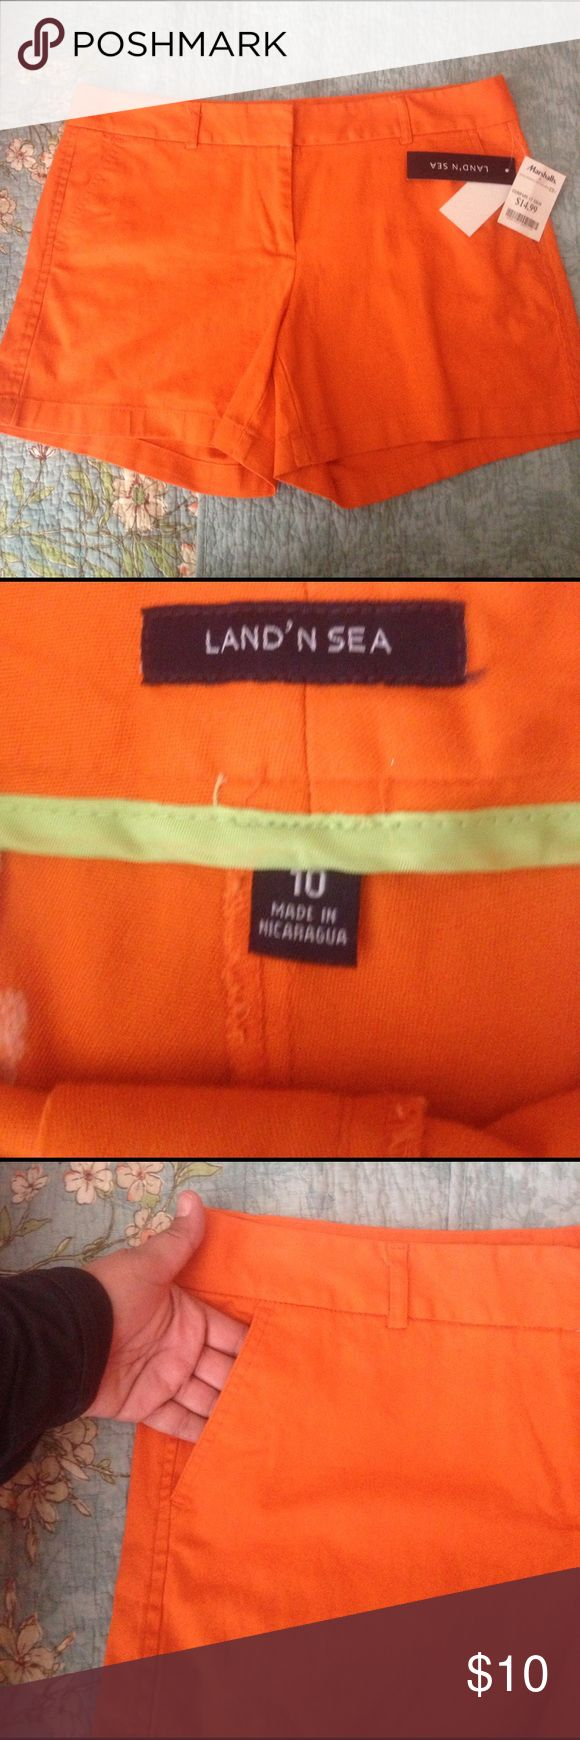 "Women's Orange Shorts by Land 'n Sea New with tags!!!  Orange shorts, with front pockets, 13"" length, from waist to hem of shorts. Shorts"